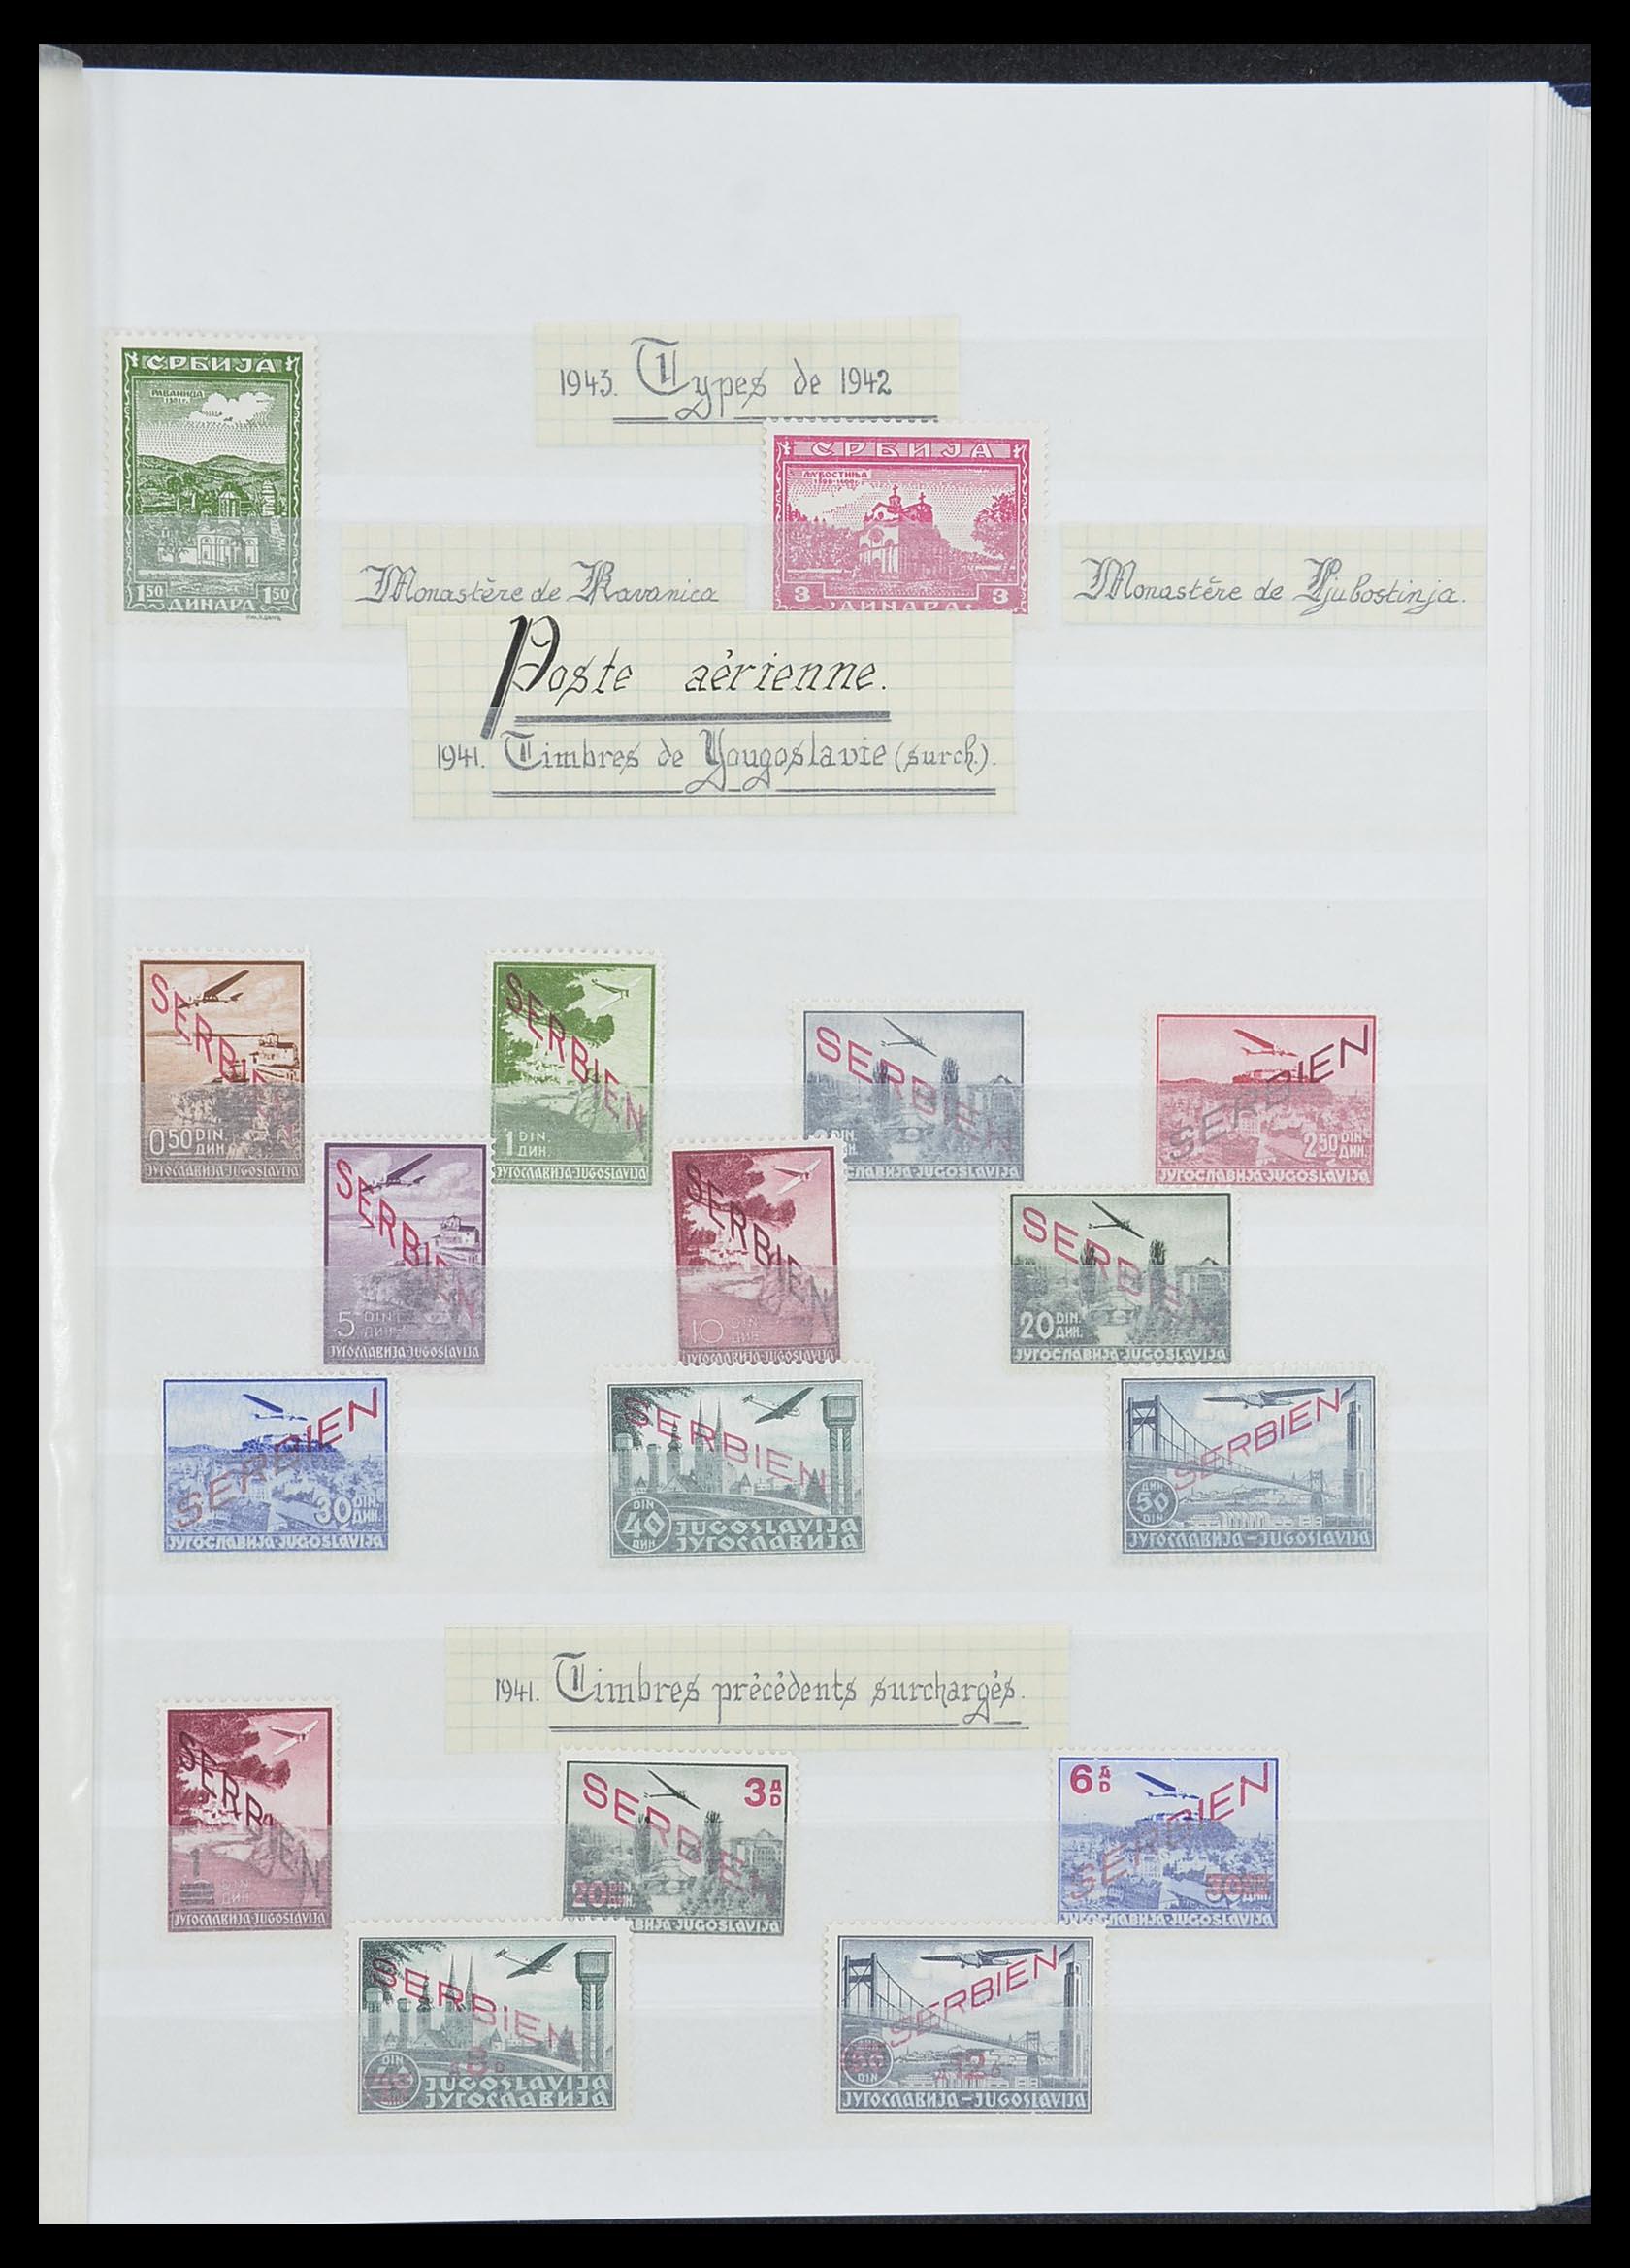 33850 017 - Postzegelverzameling 33850 Duitse bezettingen 2e wereldoorlog 1939-19